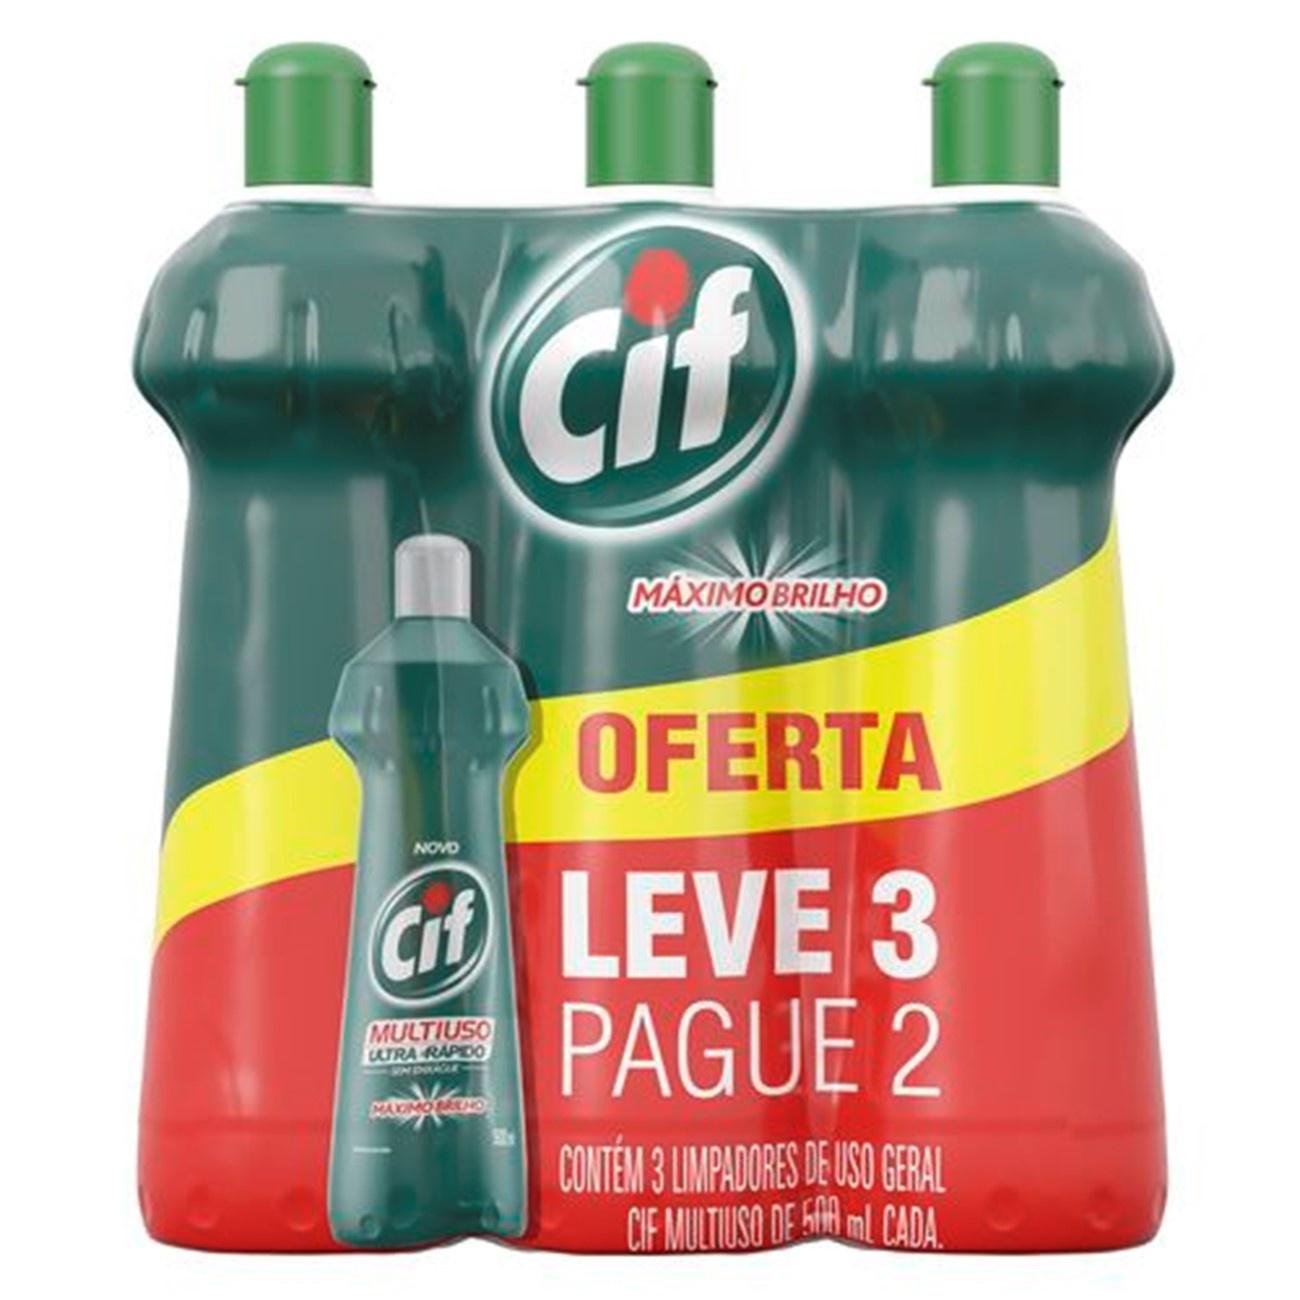 OFERTA CIF Limp Multiuso Original Leve 3 Pague 2